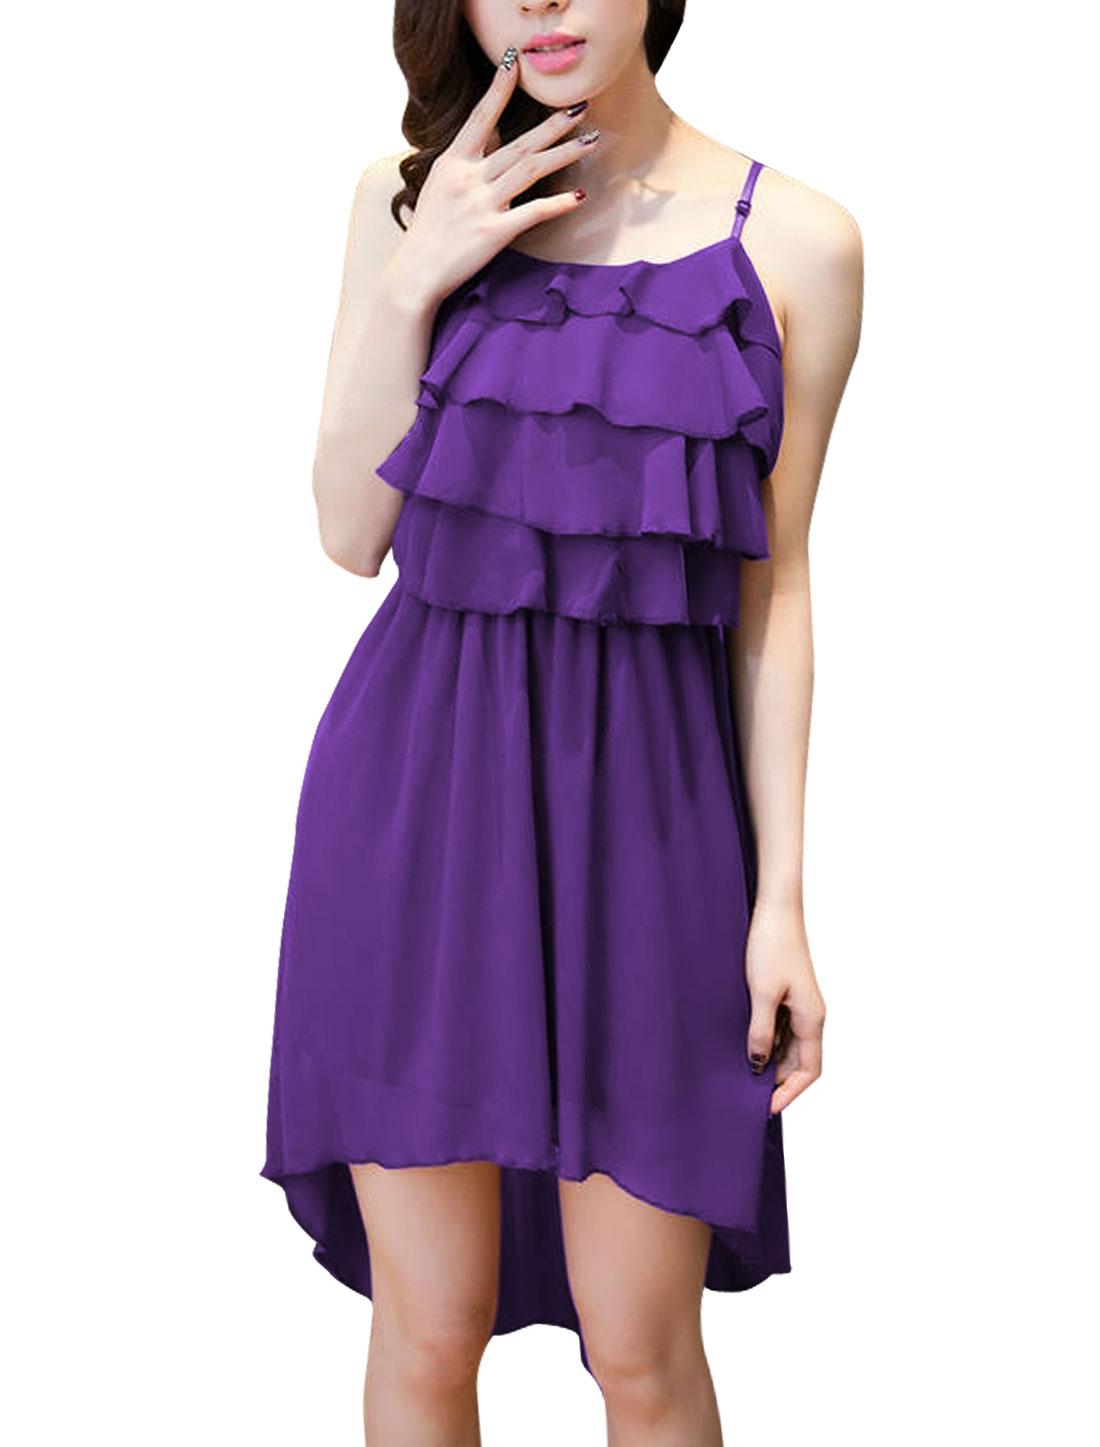 Lady Dark Purple Spaghetti Strap Lining Chiffon Dress S